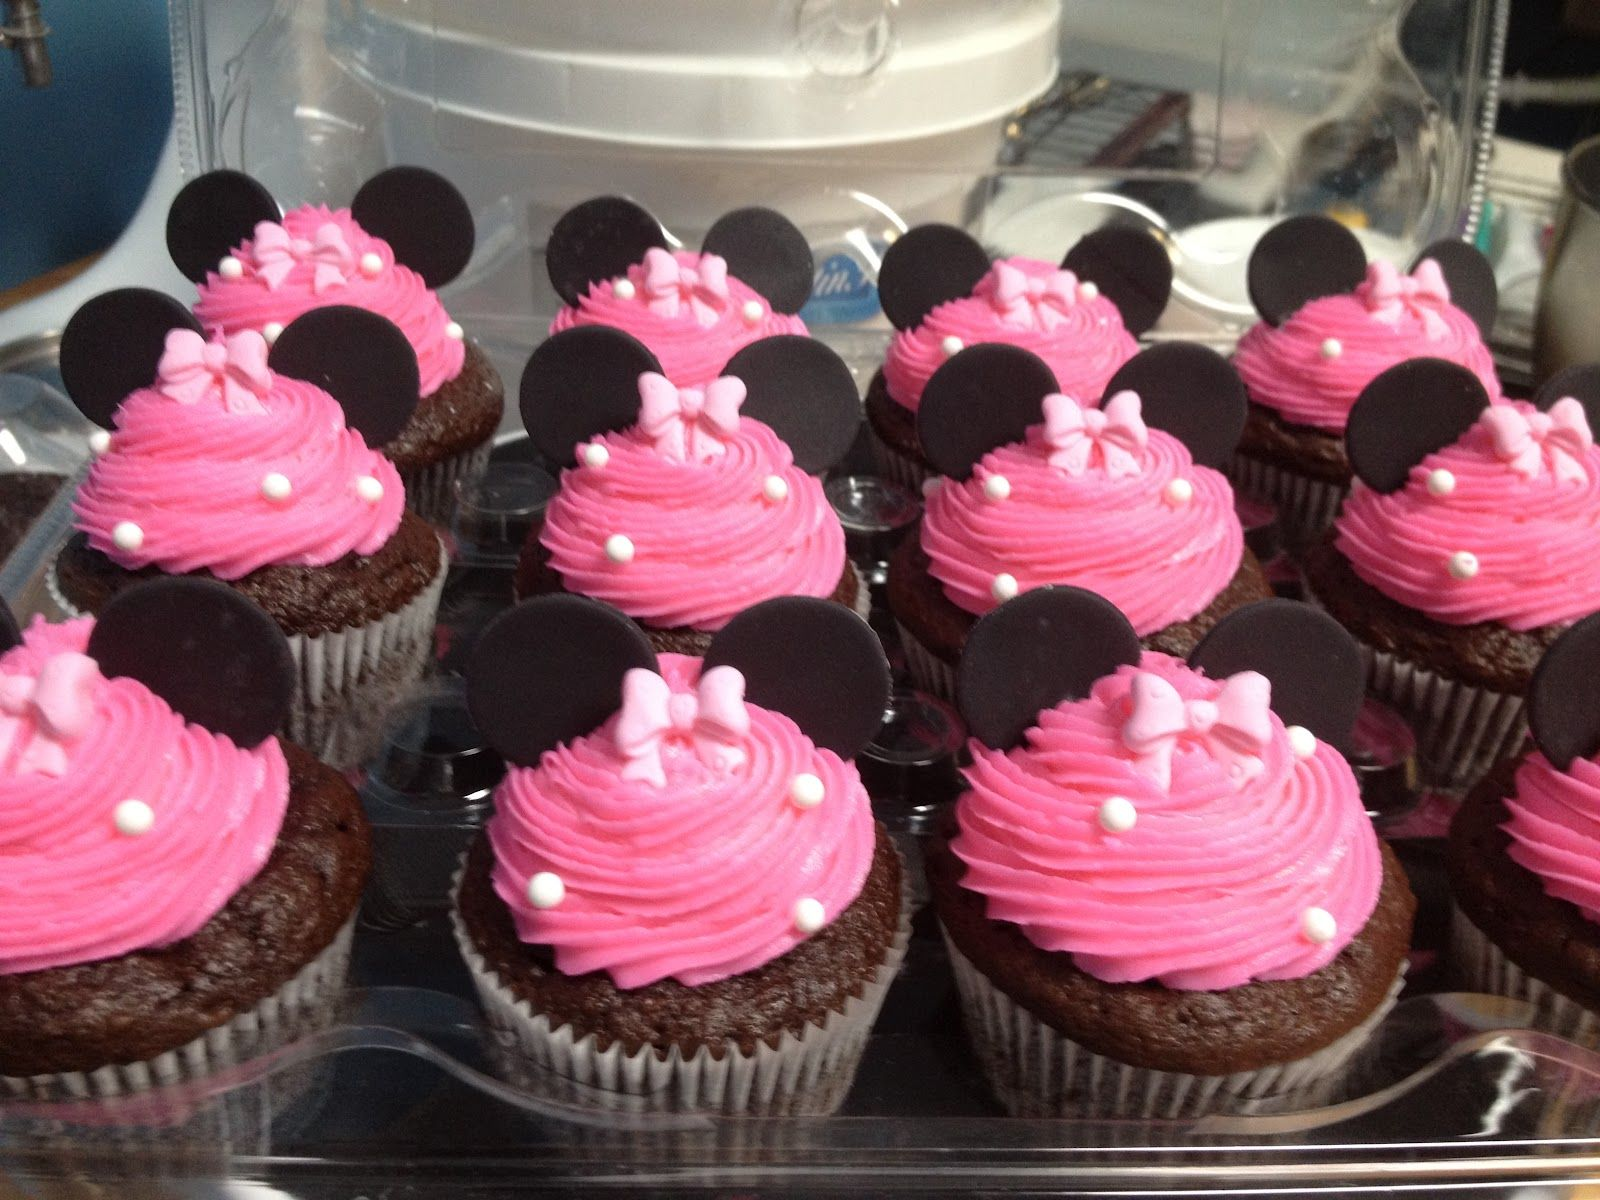 Assorted Birthday Cupcakes, Teddy bear and 3 Balloons